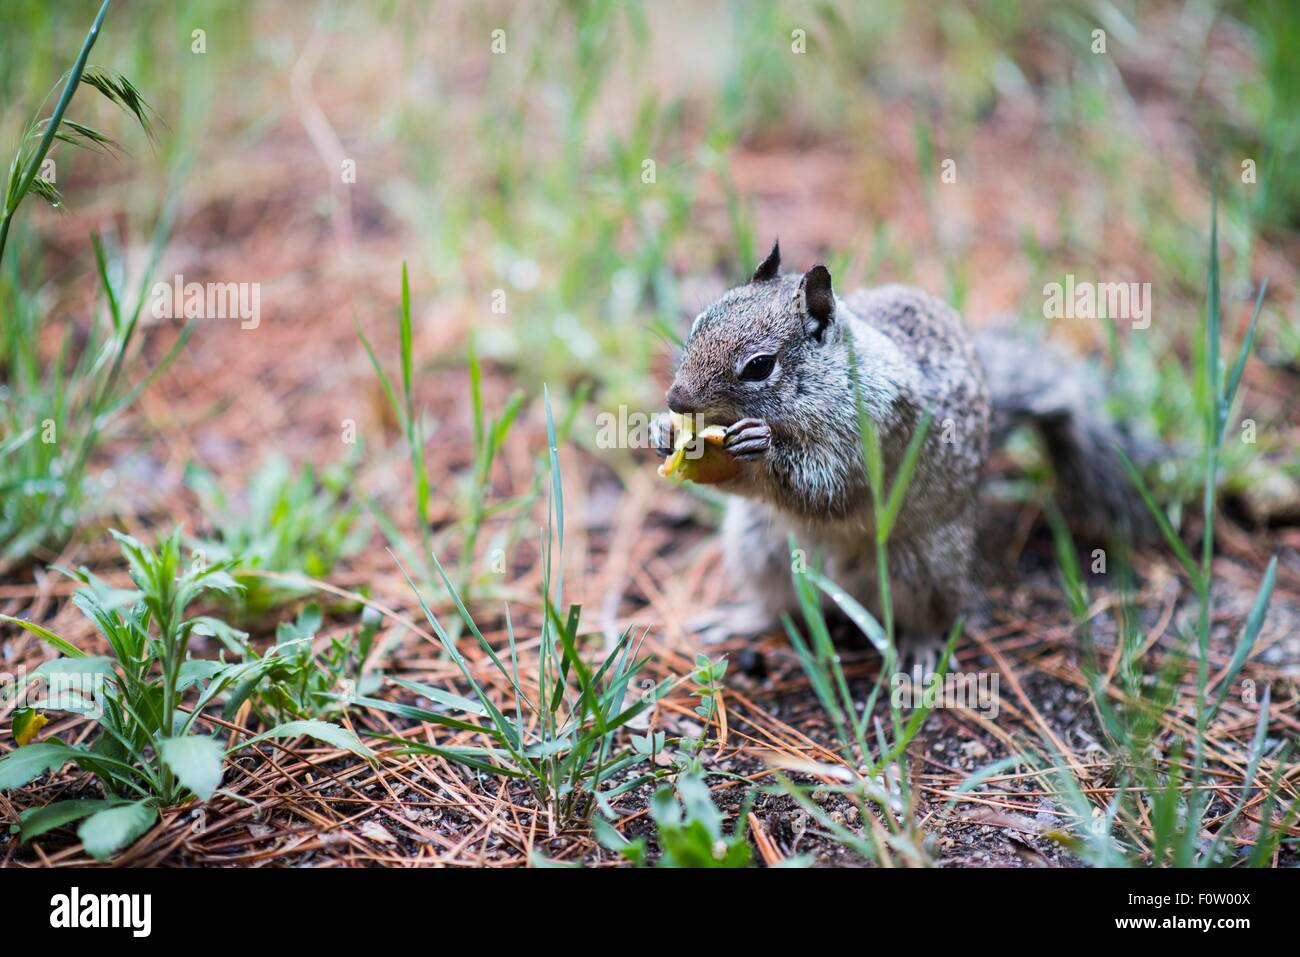 Rez-écureuil, Yosemite National Park, California, USA Photo Stock